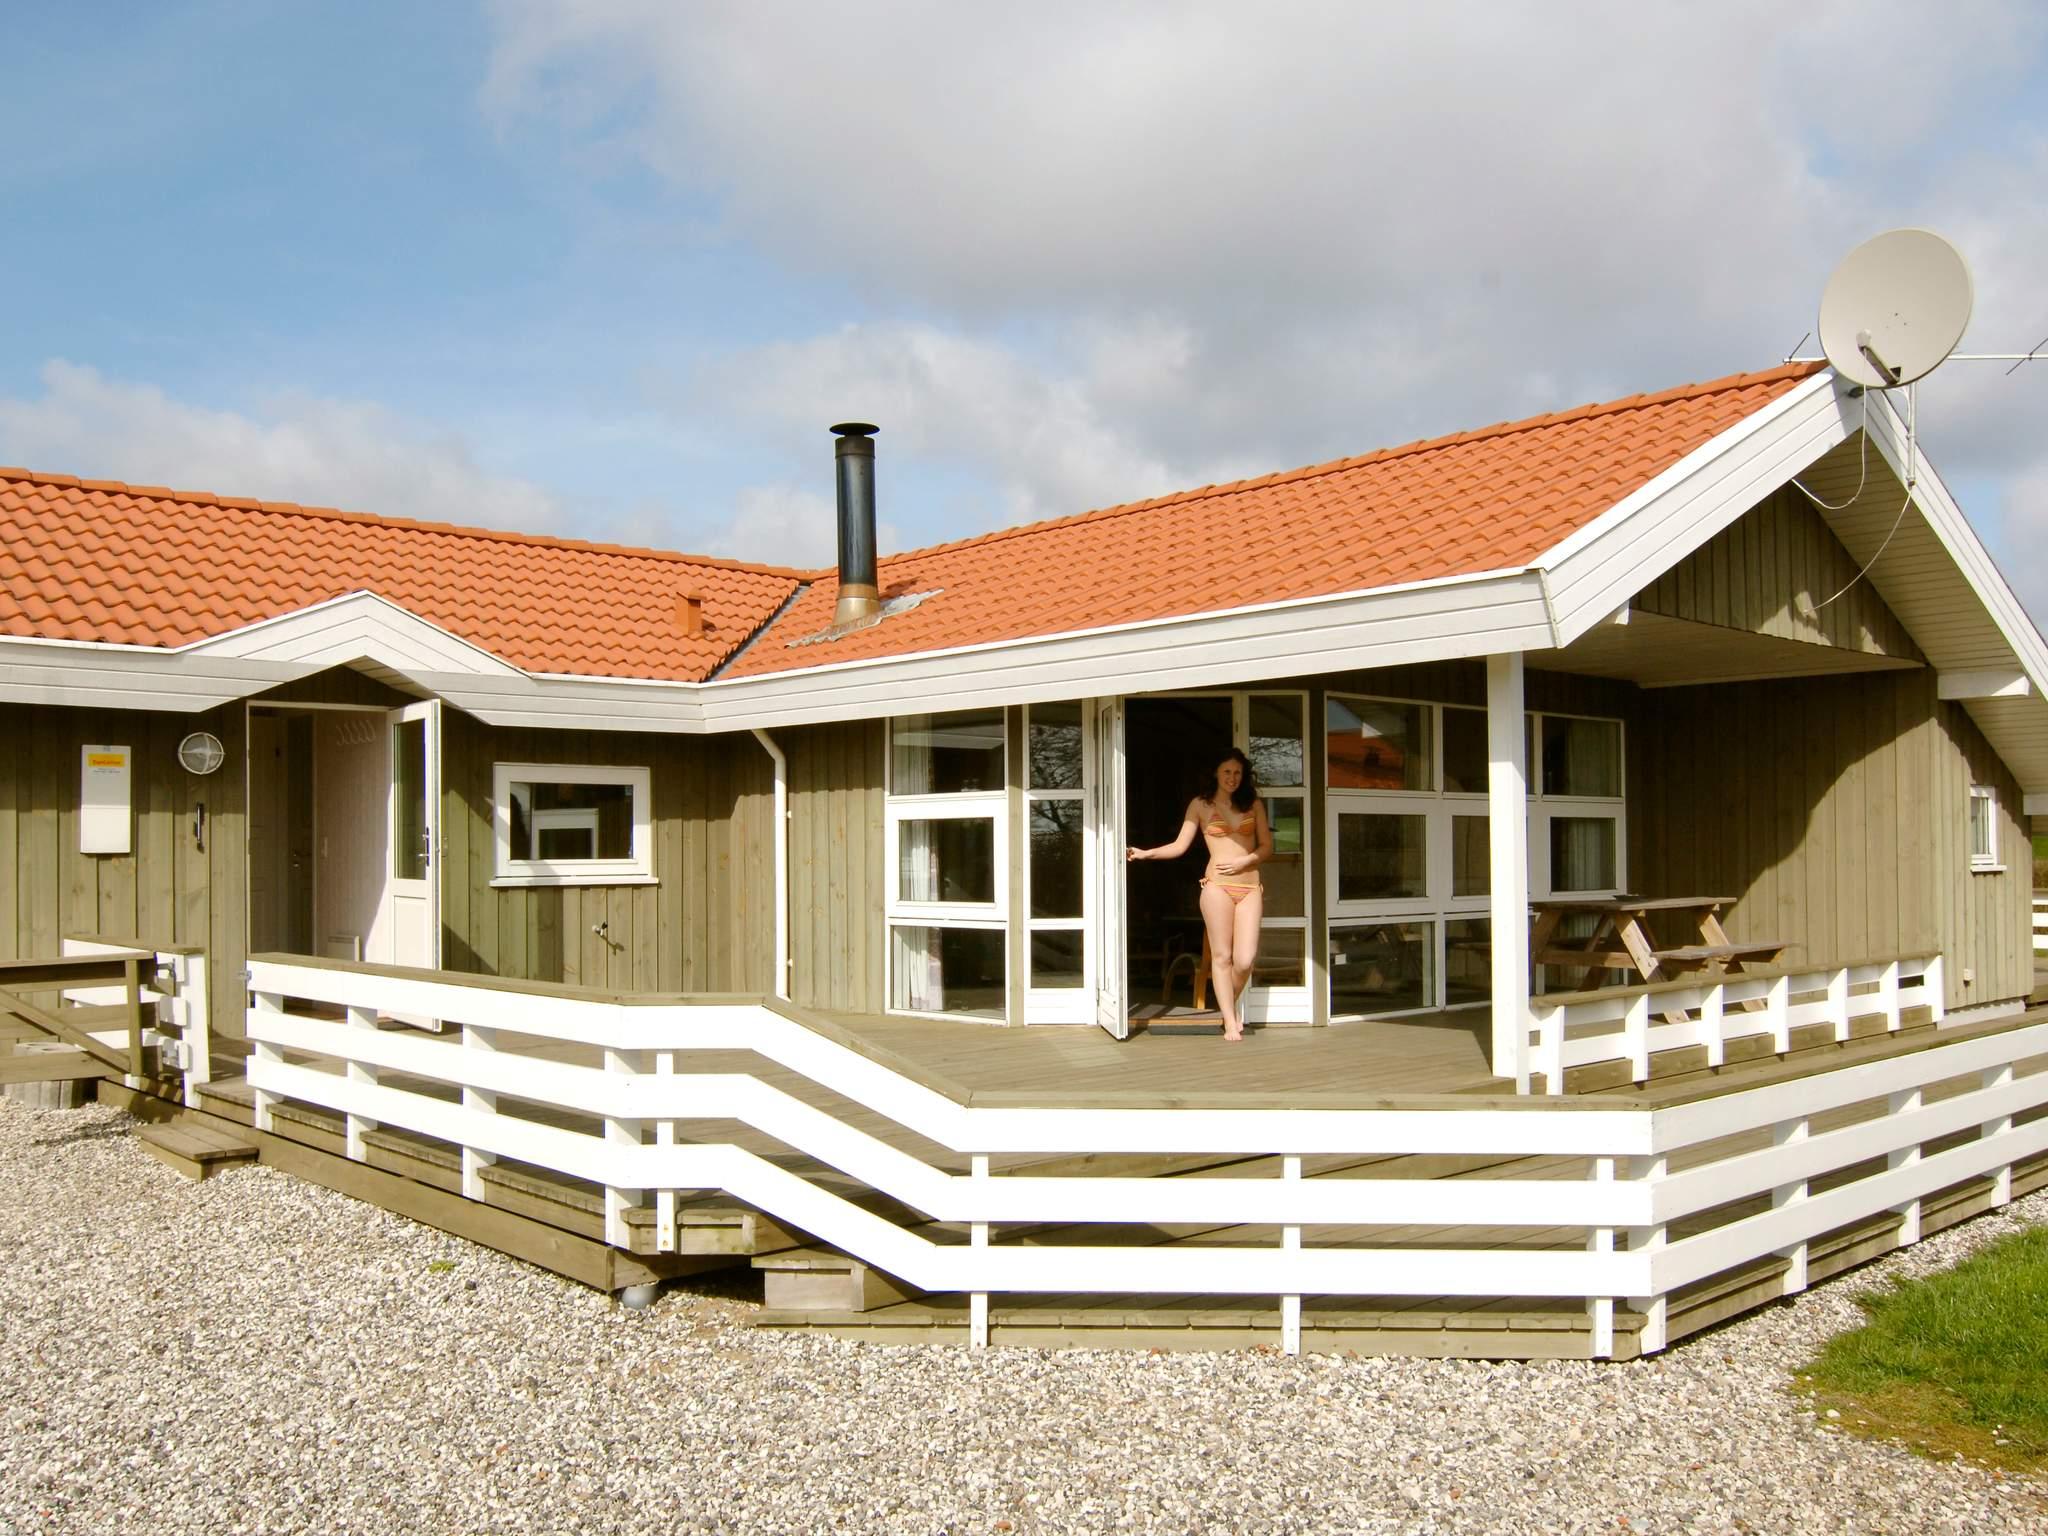 Ferienhaus Mørkholt (125852), Mørkholt, , Ostjütland, Dänemark, Bild 1